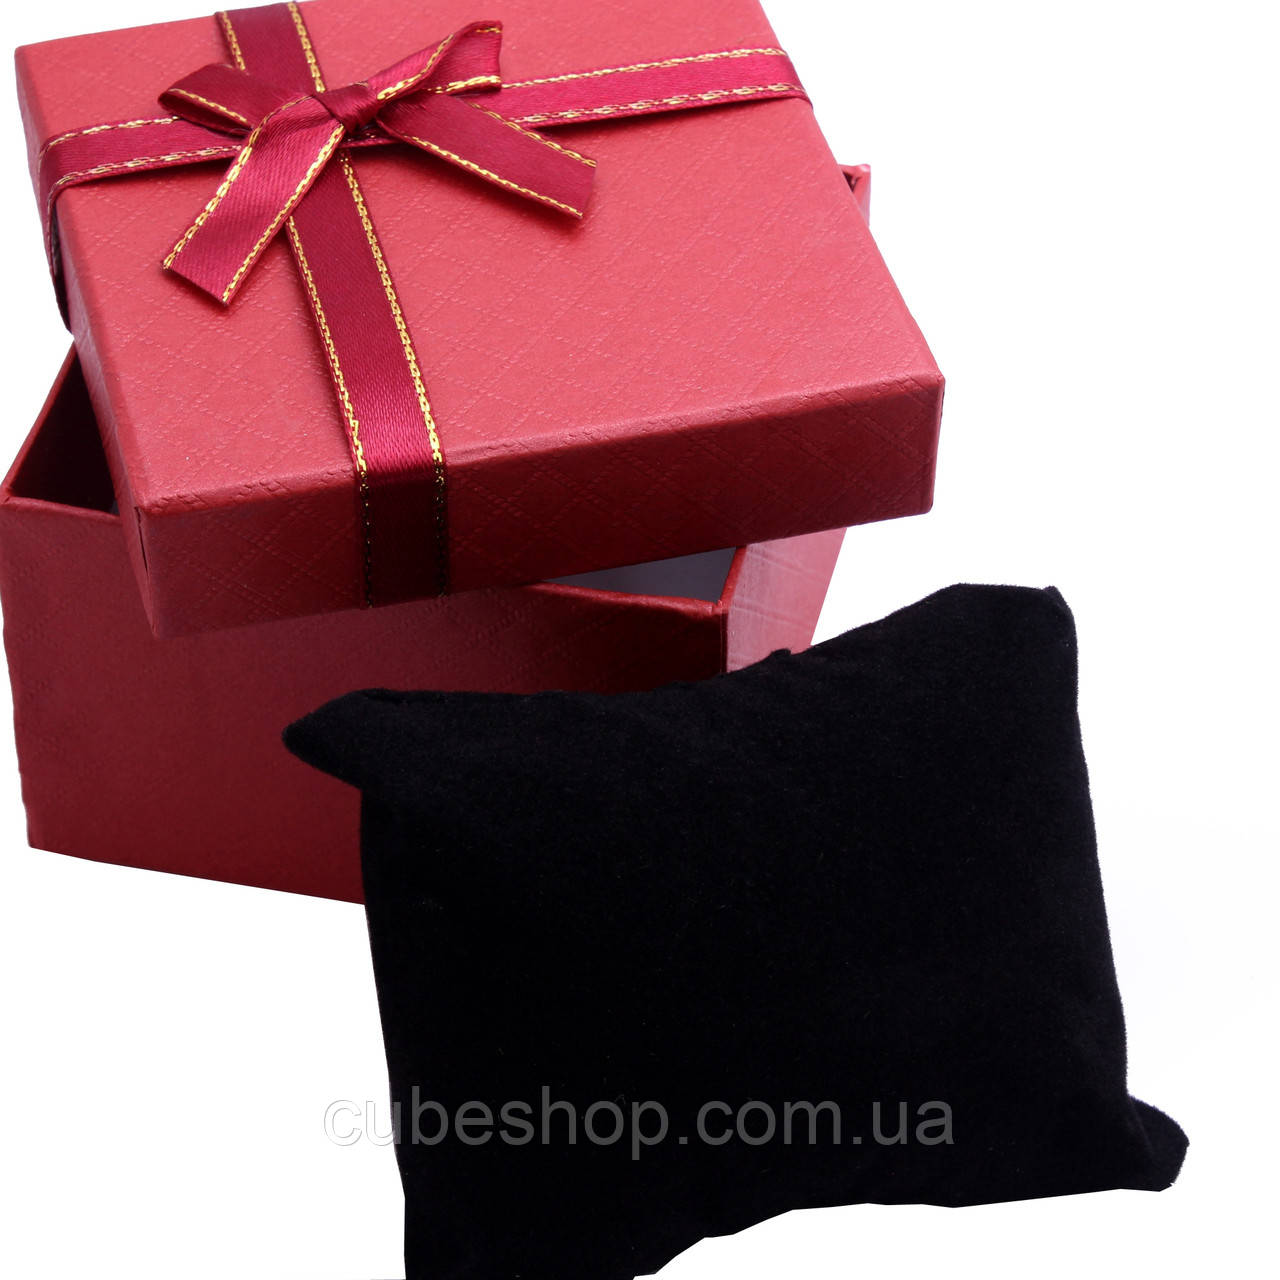 Коробочка с подушкой 90х90х60мм - Классика